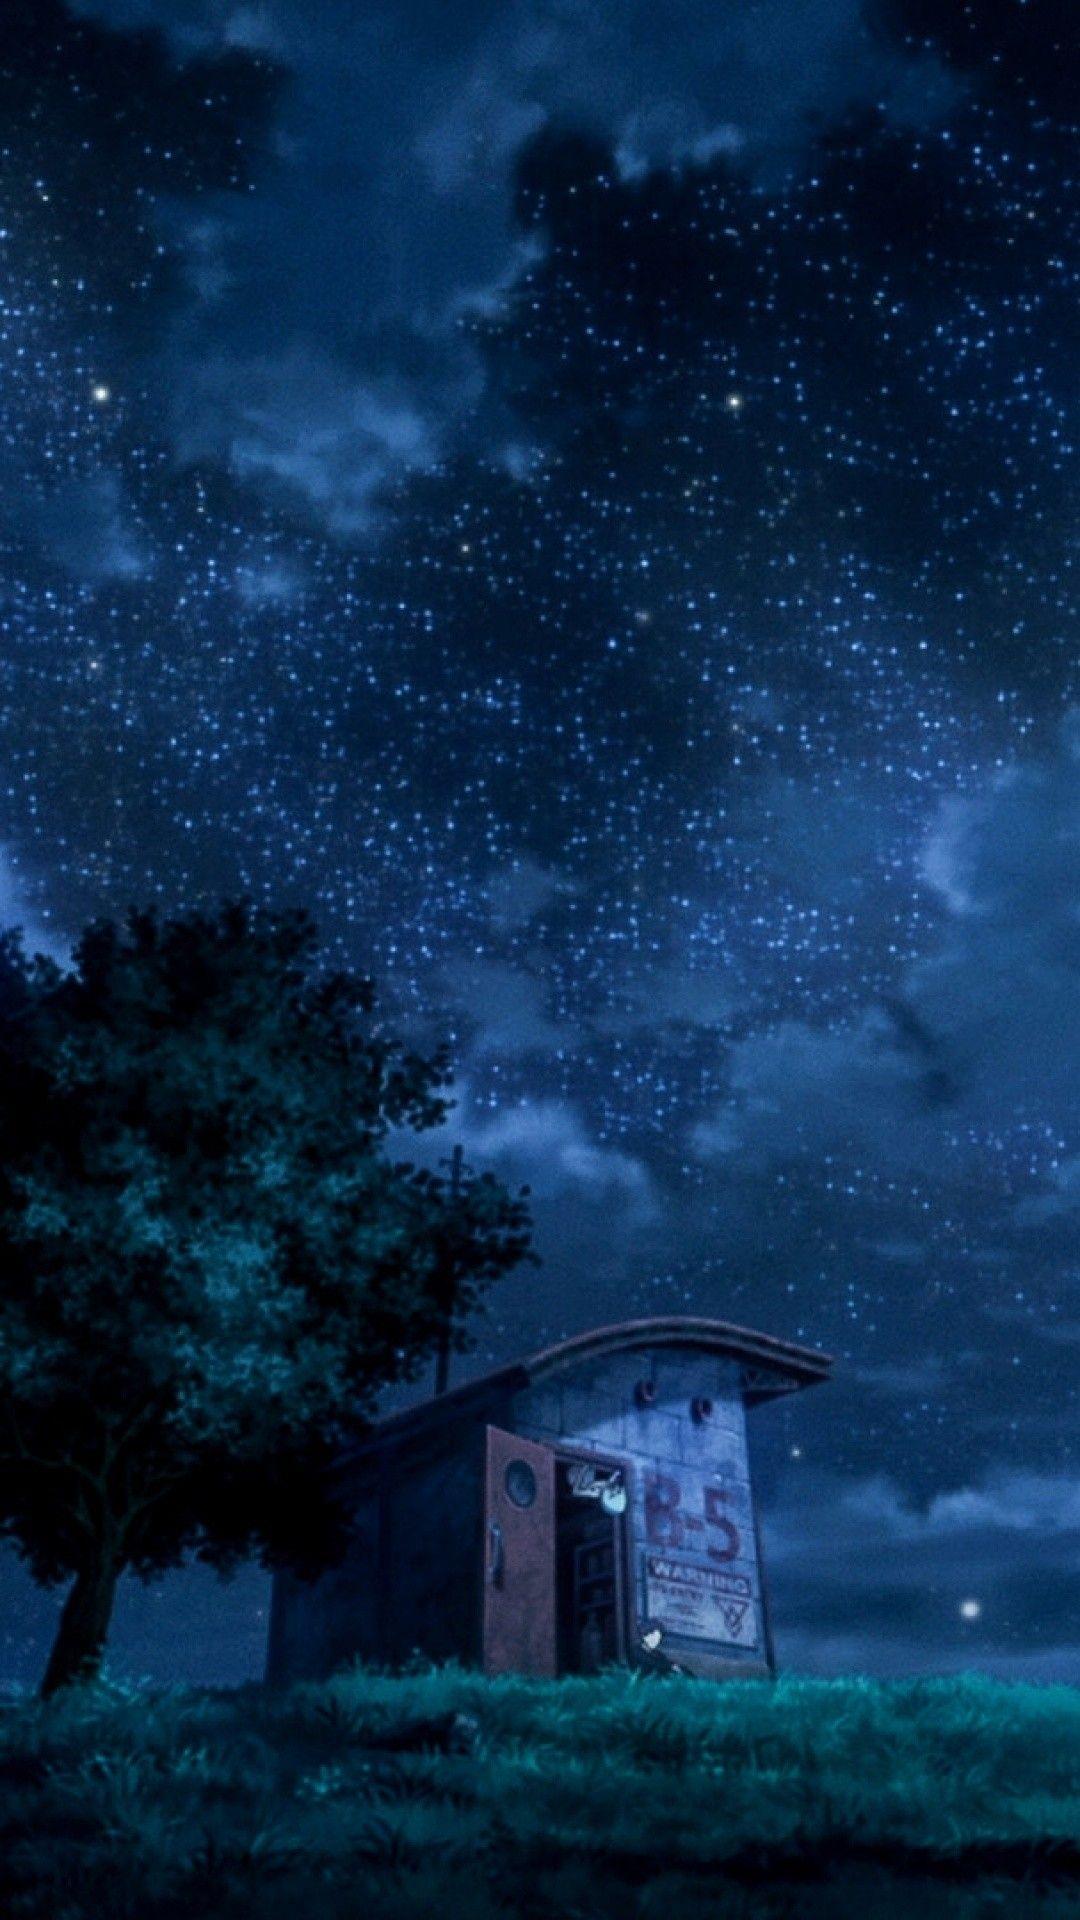 Aesthetic Night Sky Wallpaper Anime Novocom Top